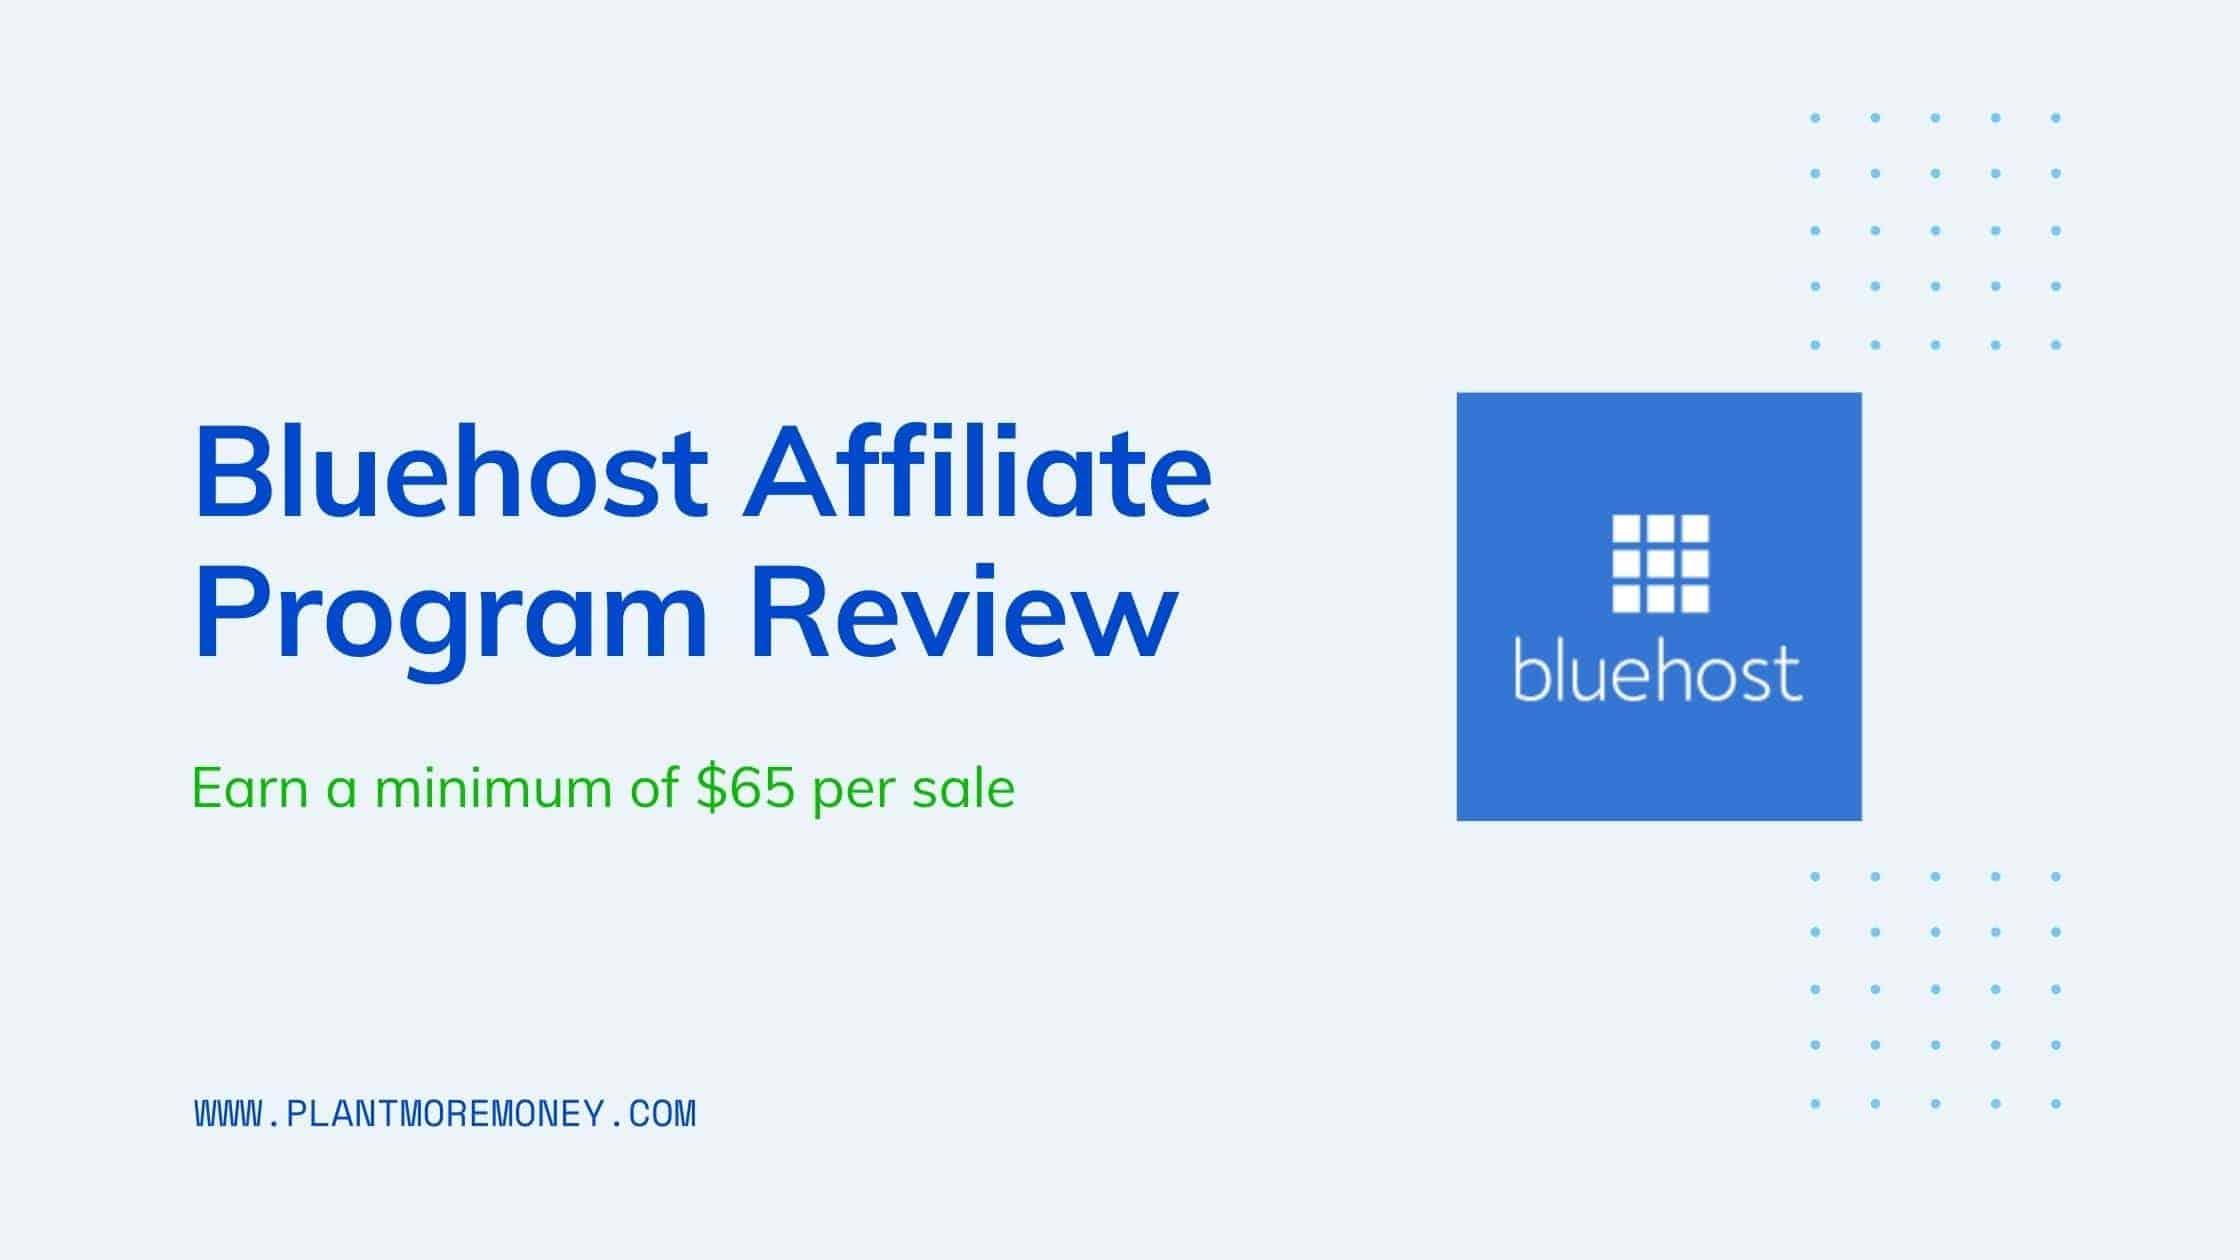 Bluehost affiliate program Review: Earn Minimum $65 Per Sale